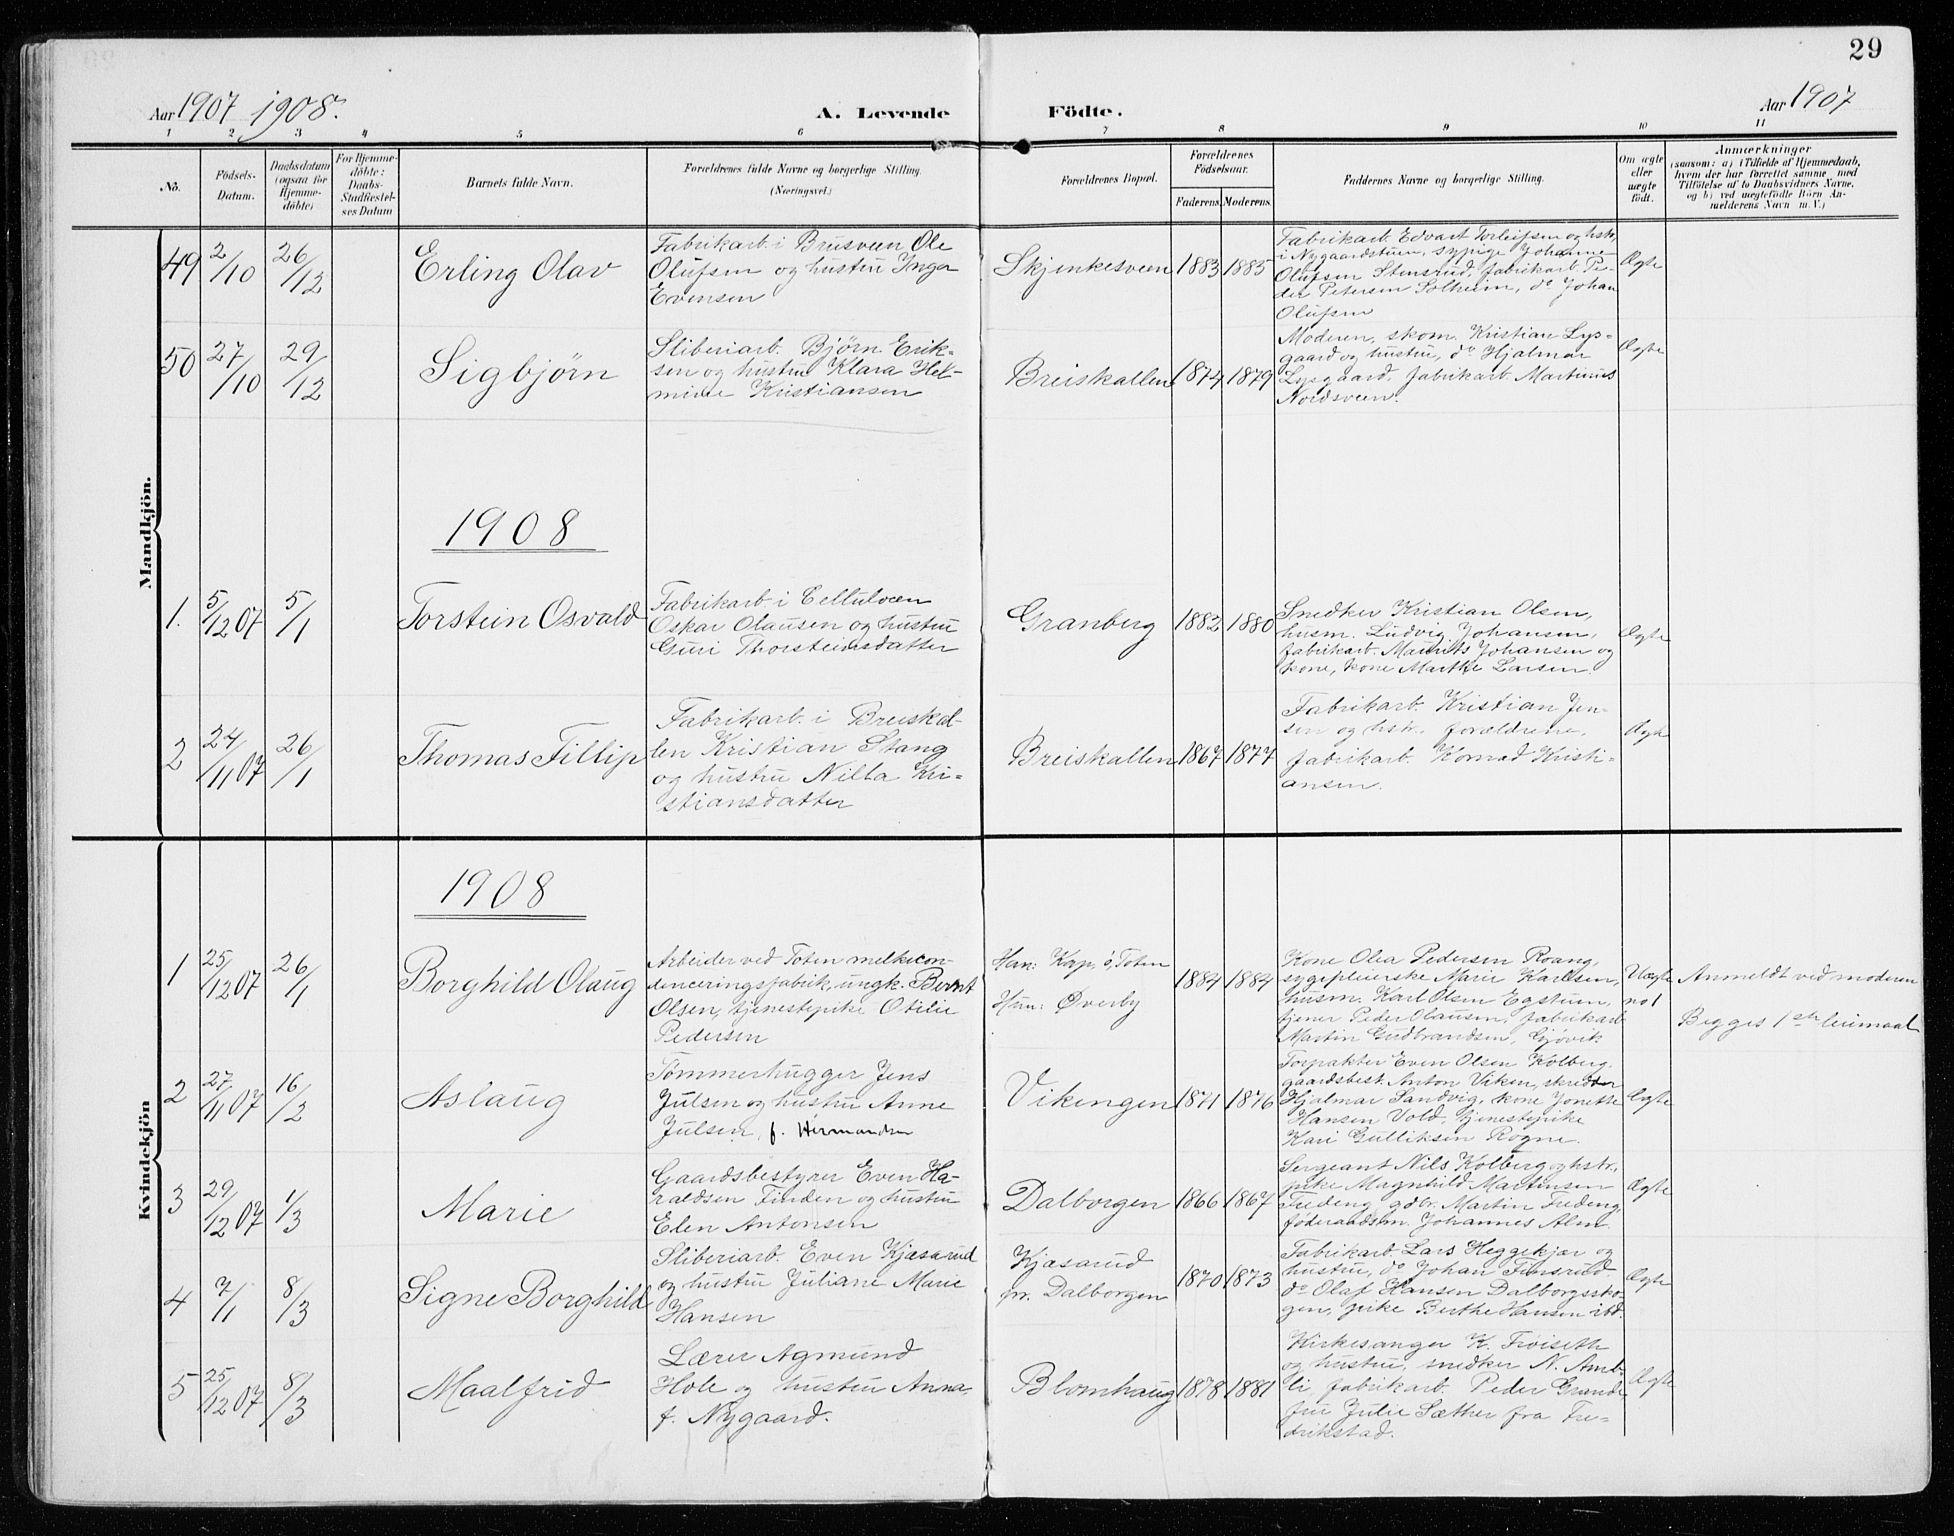 SAH, Vardal prestekontor, H/Ha/Haa/L0016: Ministerialbok nr. 16, 1904-1916, s. 29